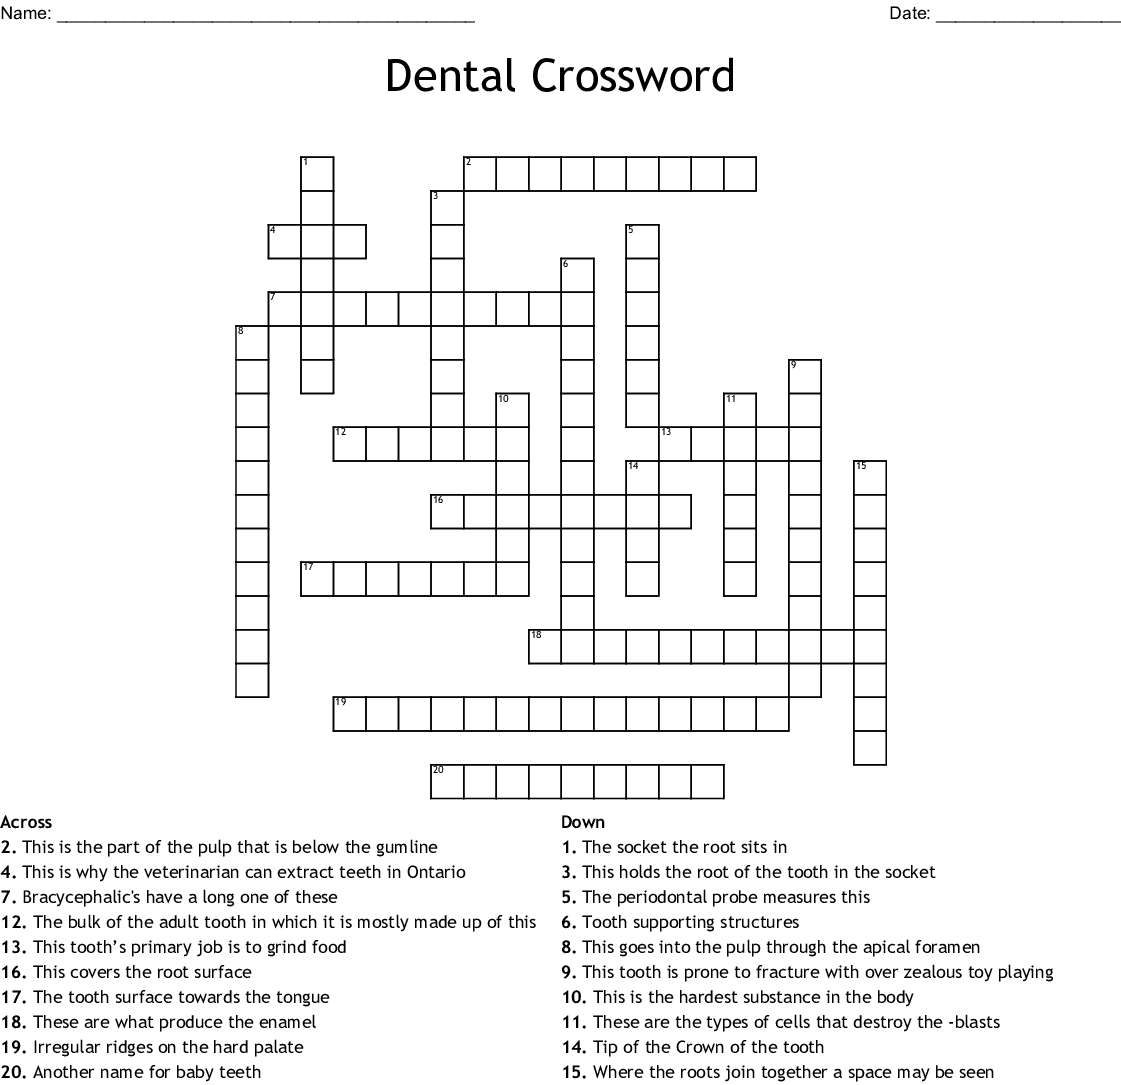 Dental Crossword